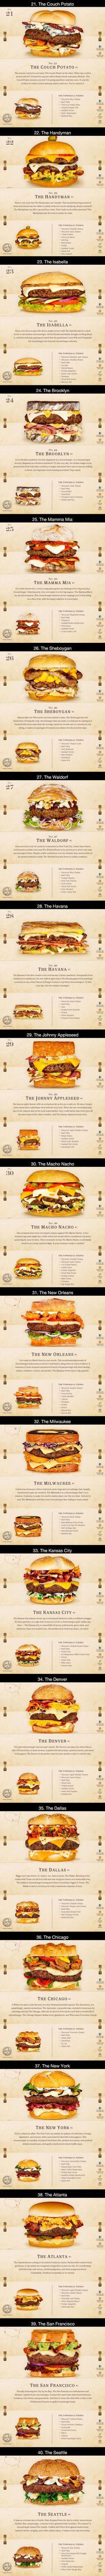 40 Glorious Burger Combinations